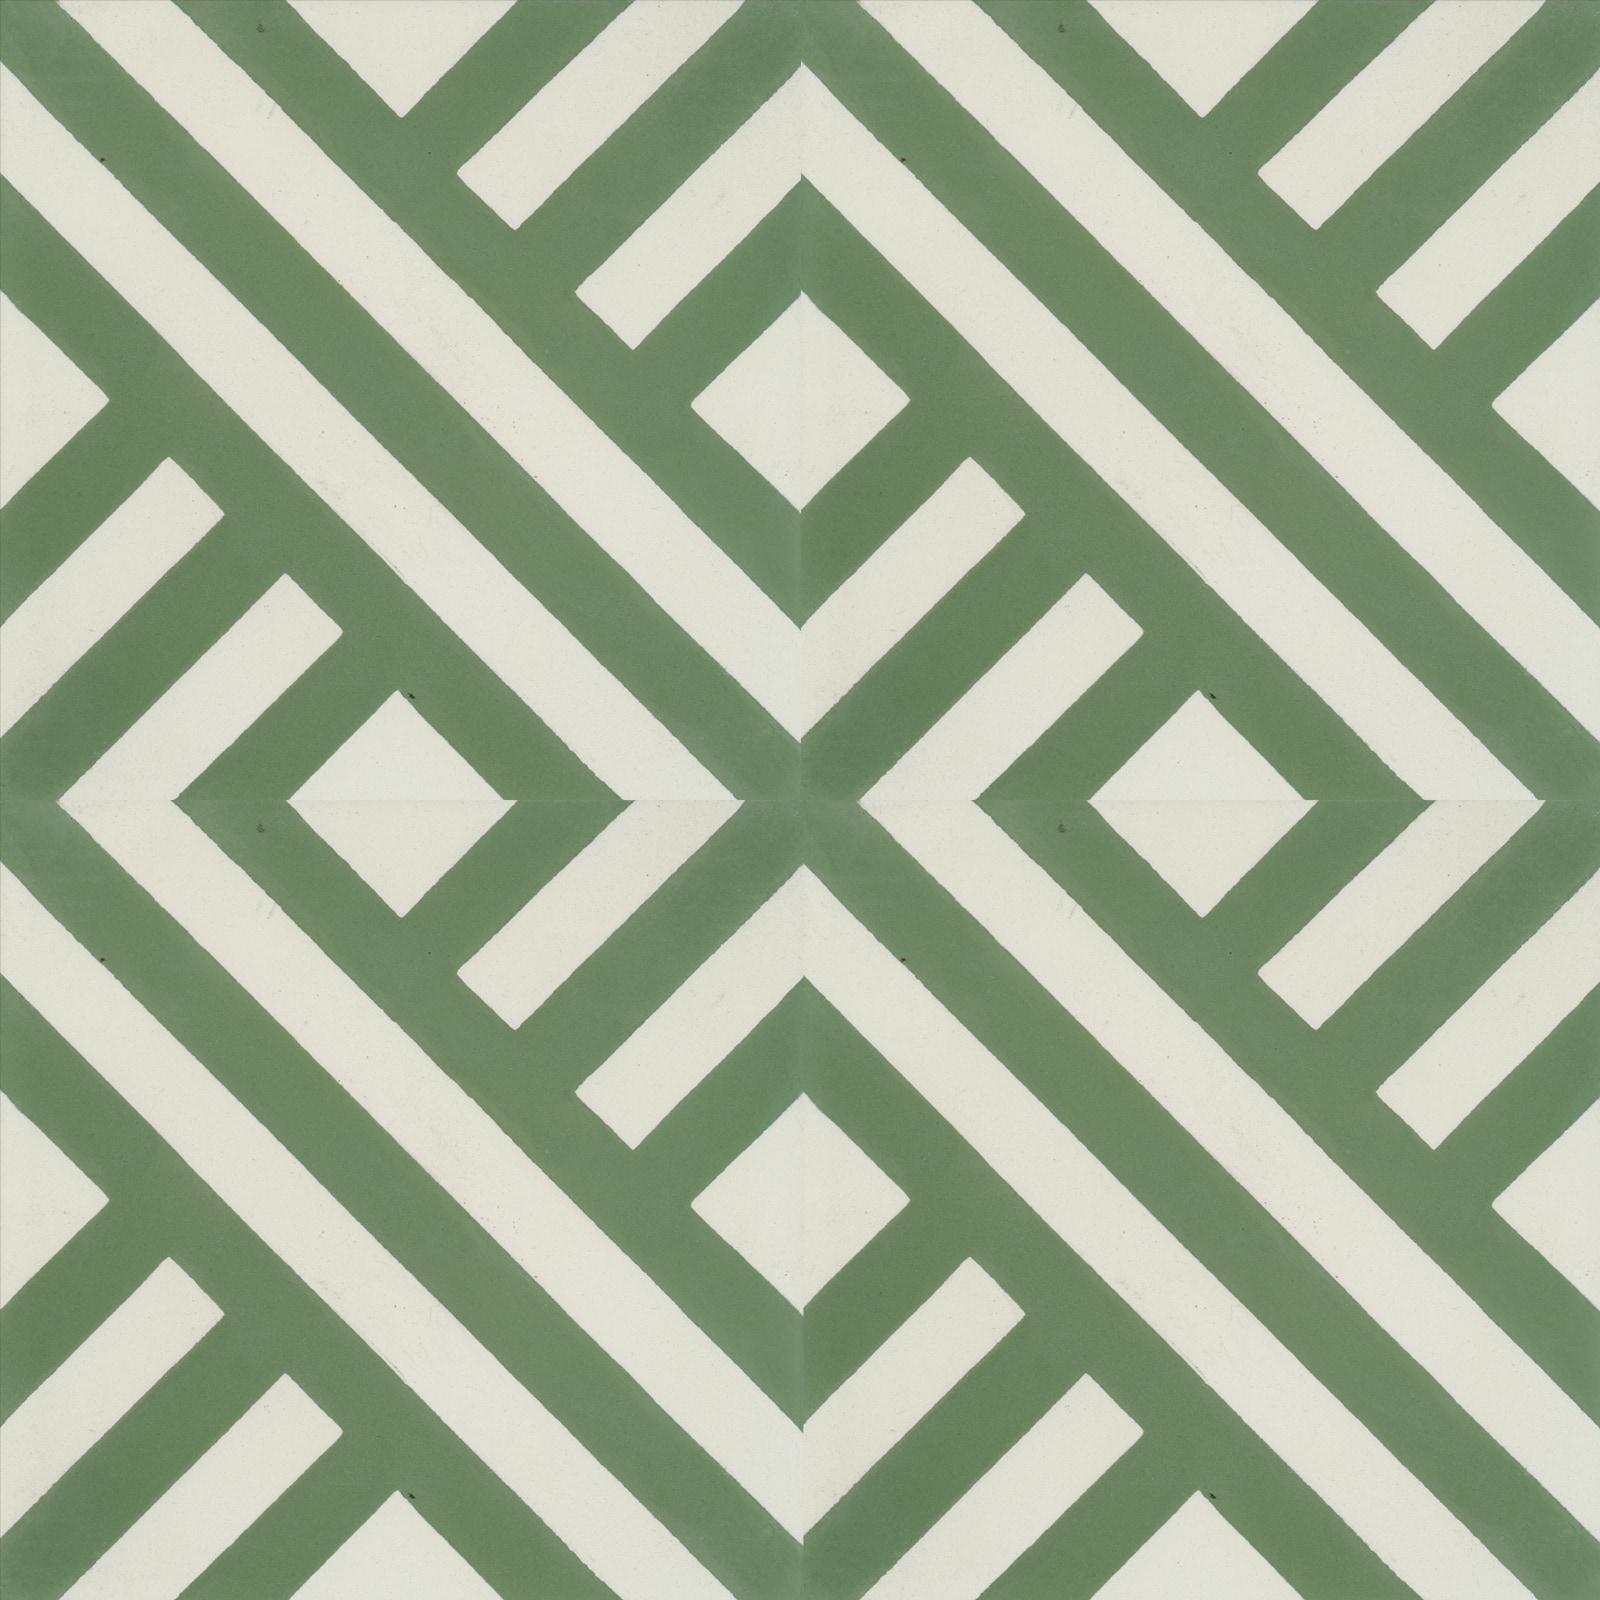 zementmosaikfliesen-nr.14853-verlegemuster-viaplatten | 14853